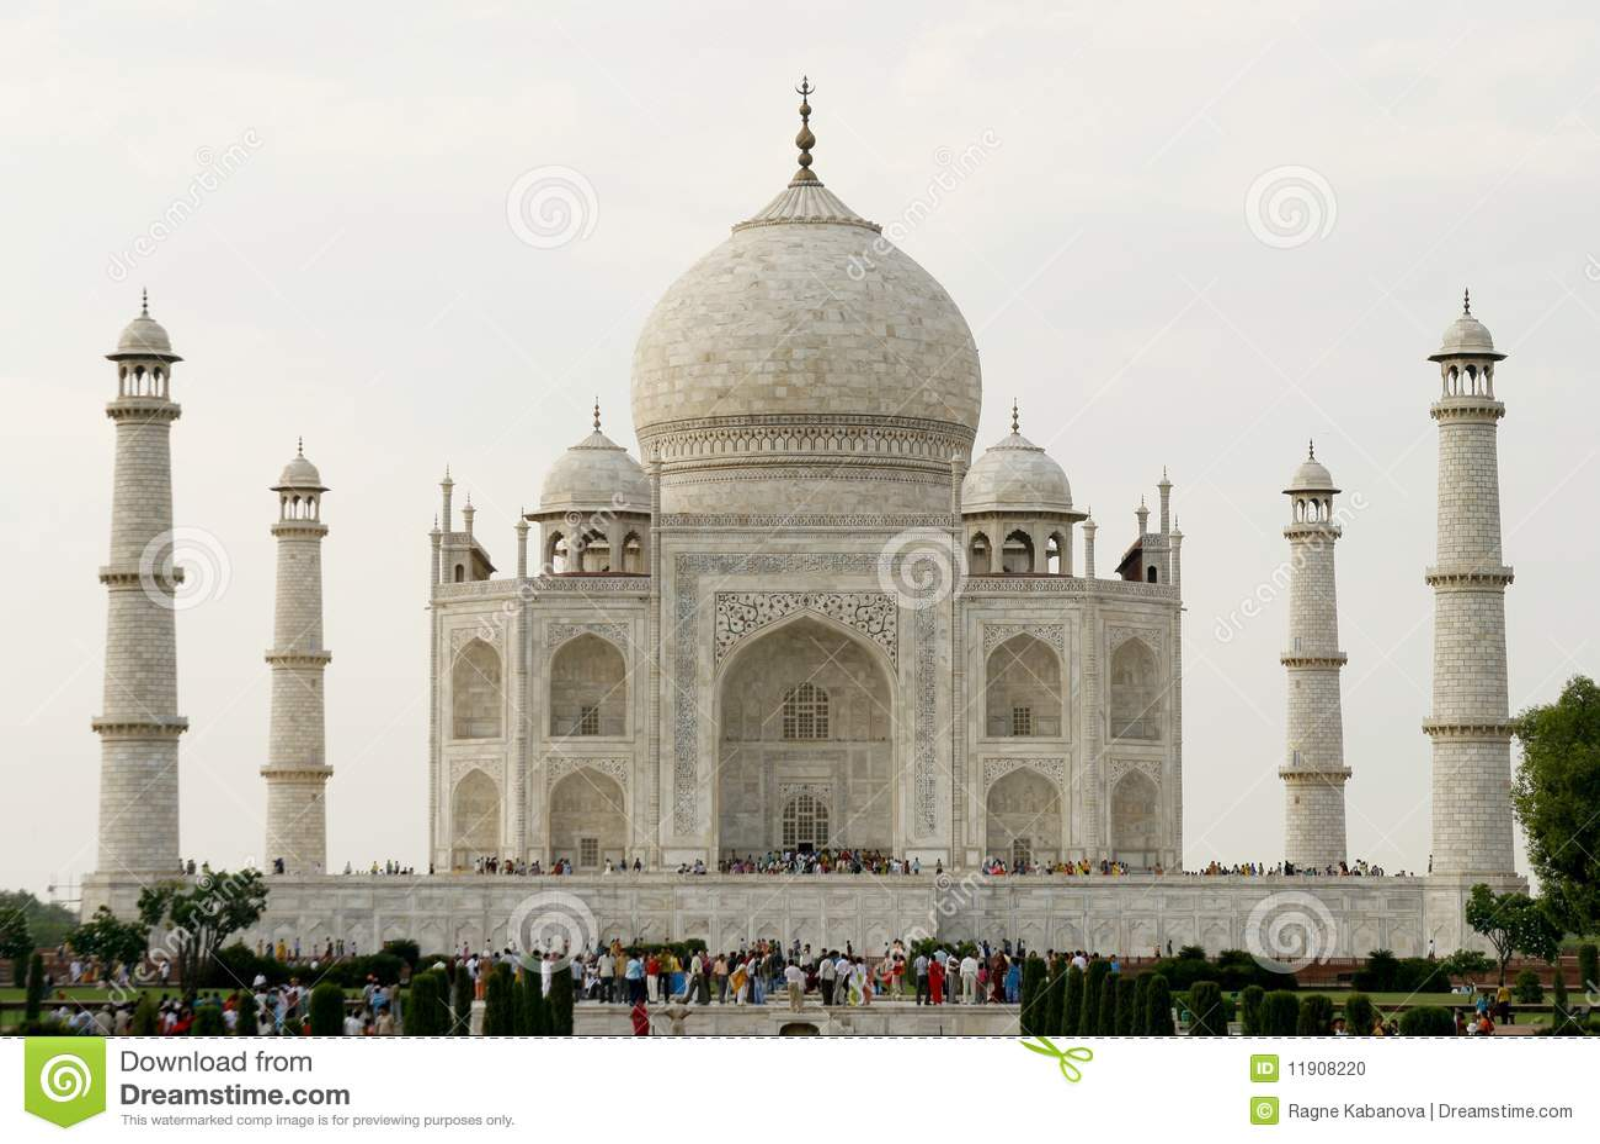 Masjid photos of dubai check out masjid photos of dubai for Agra fine indian cuisine menu